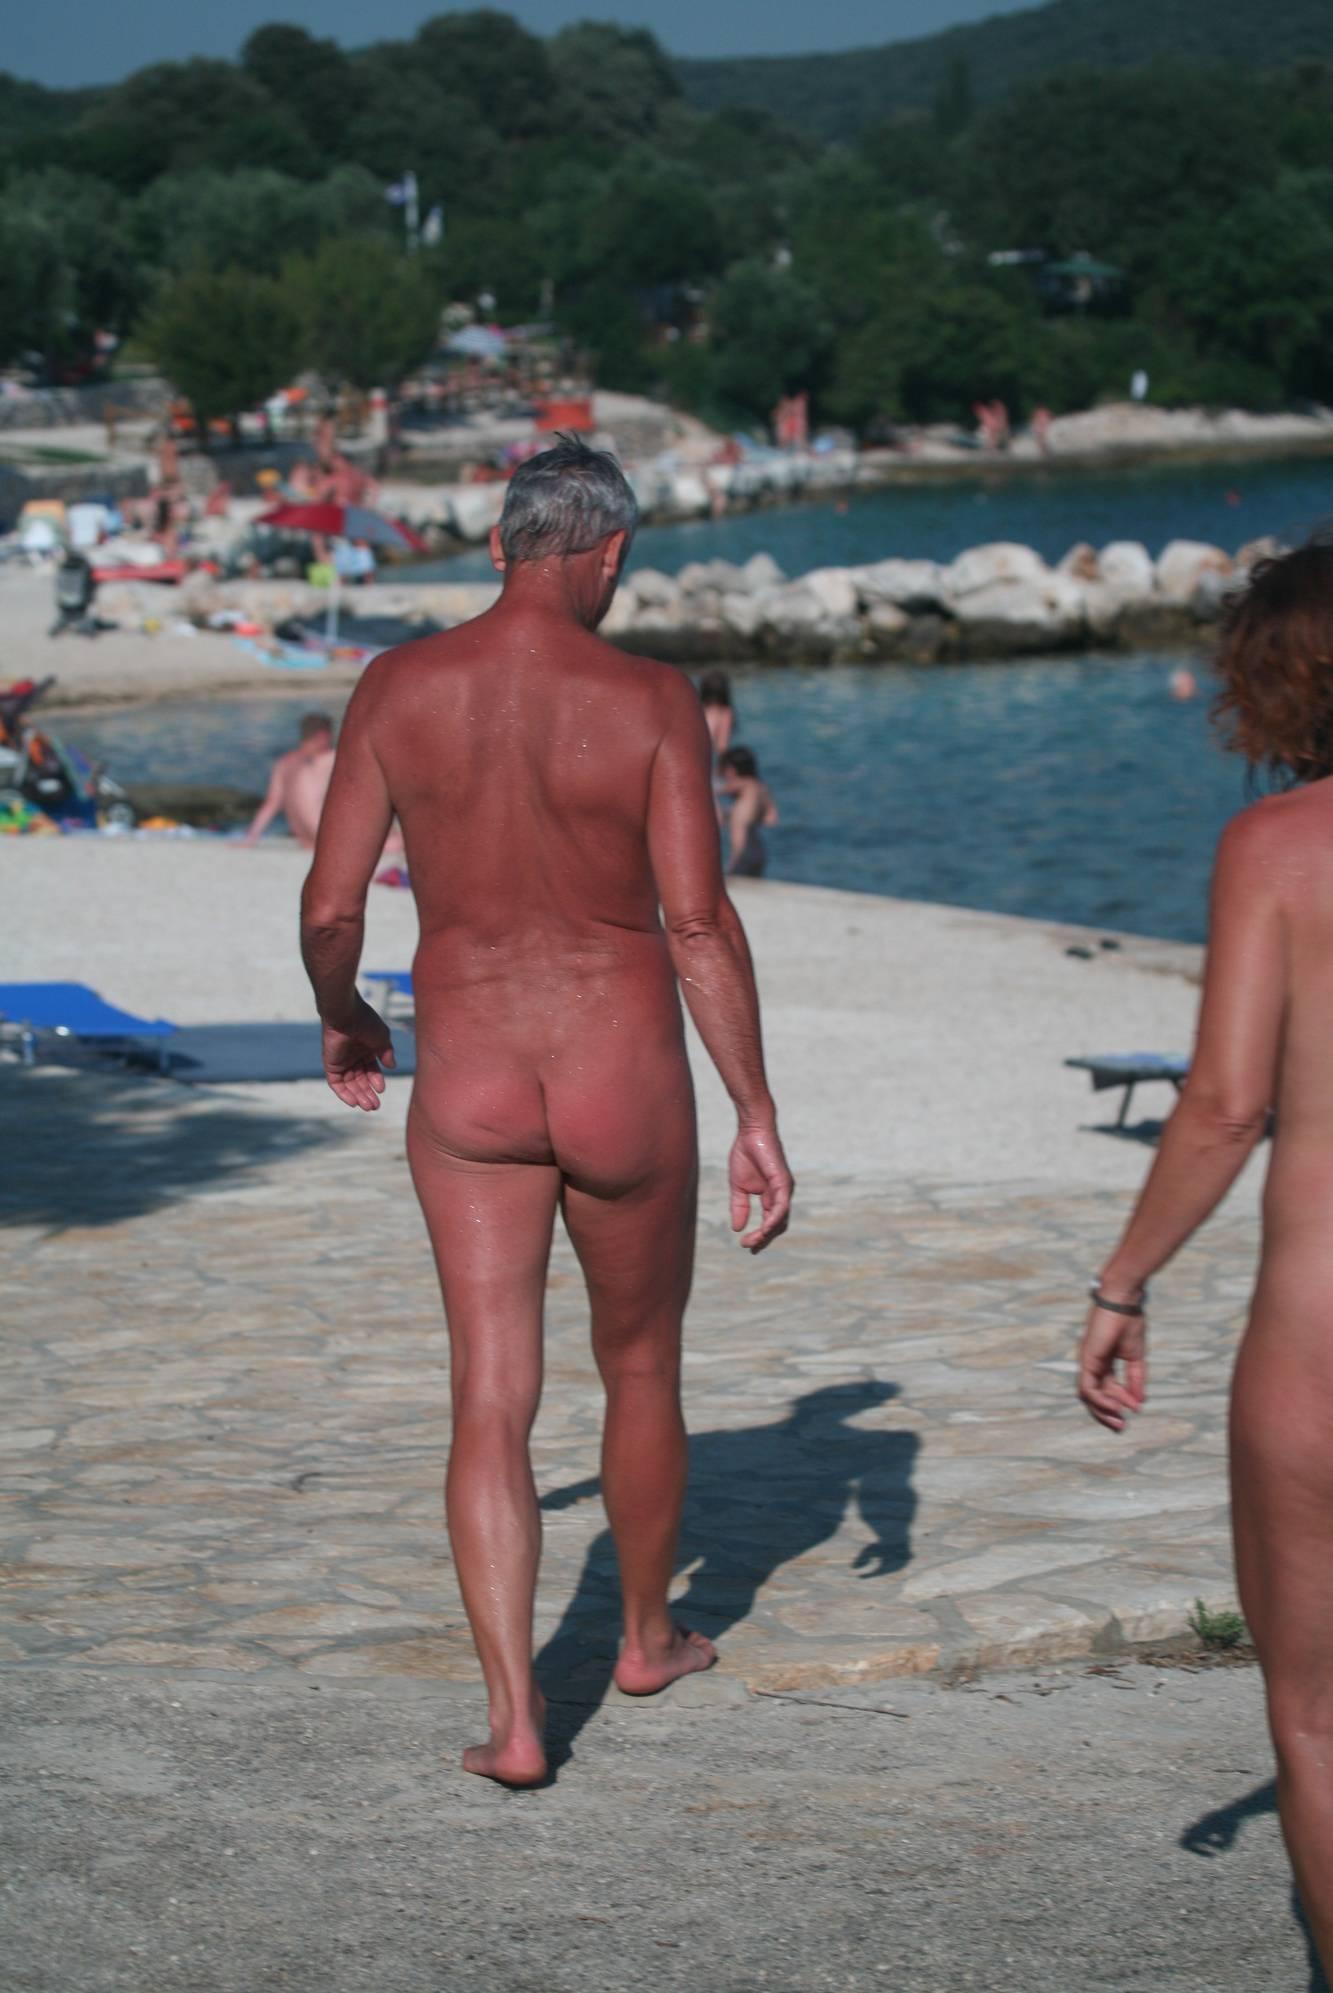 Nudist Pics Nudist Resort Shore Walk - 1